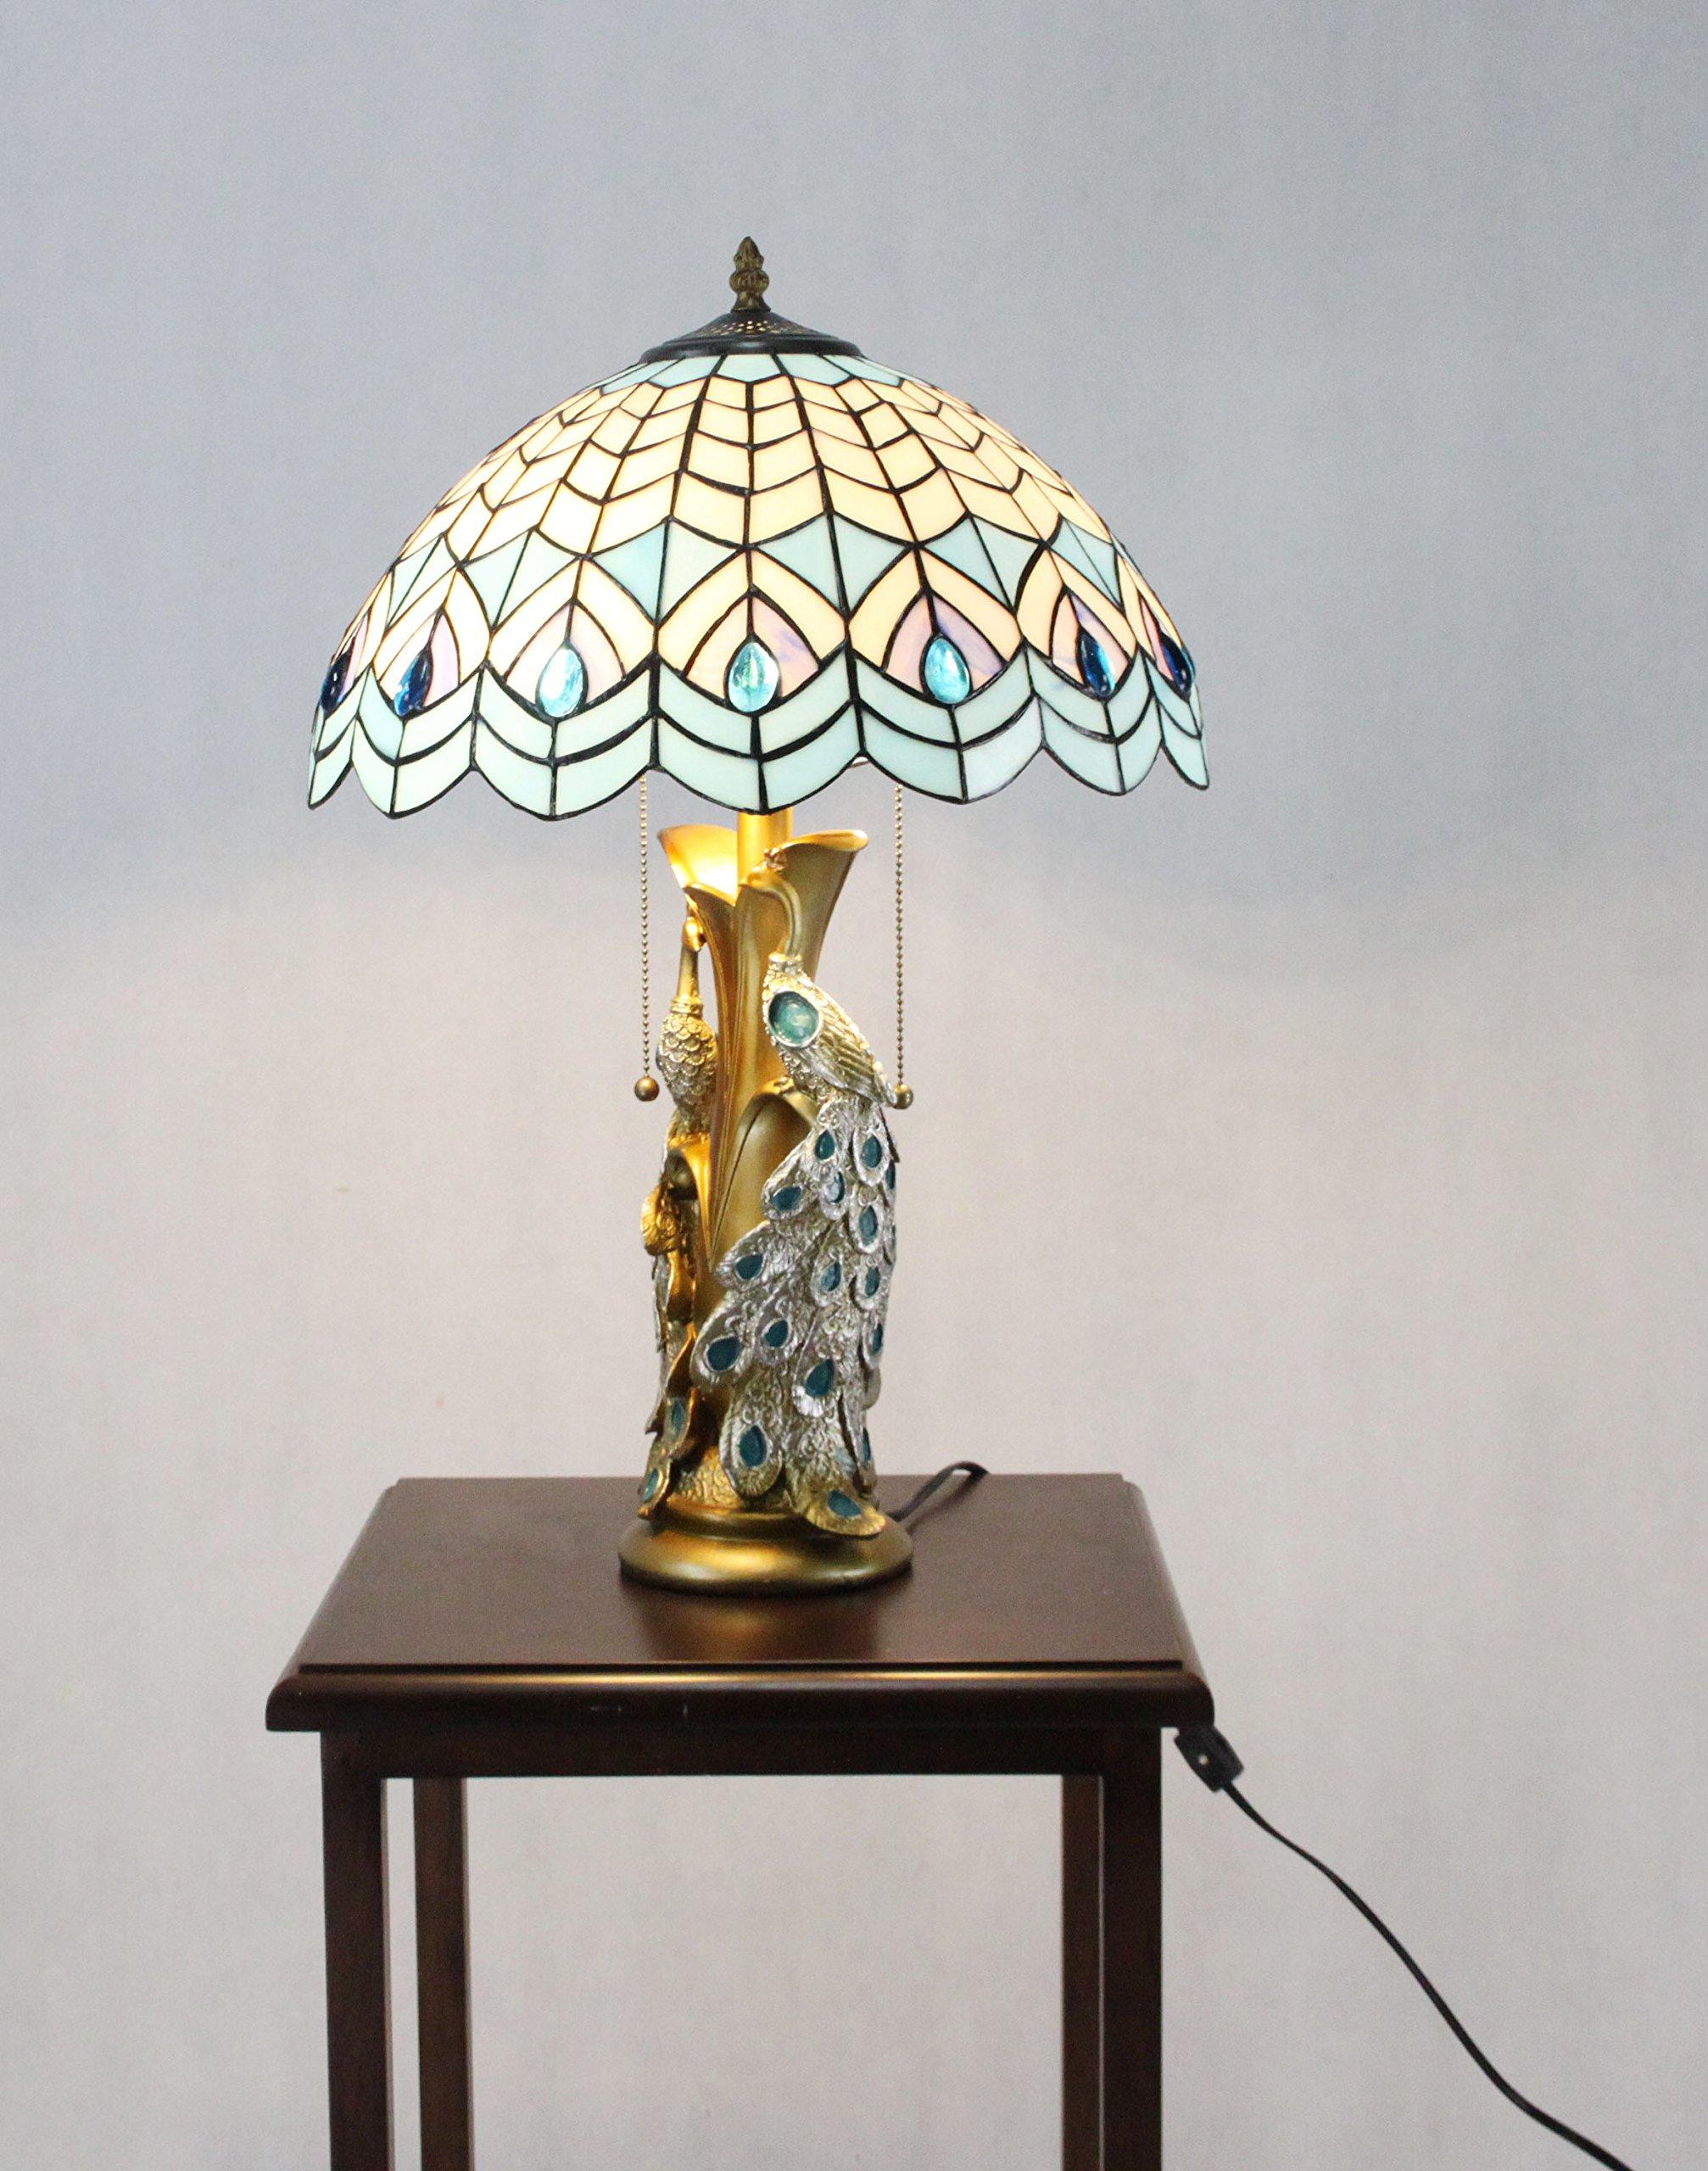 FixtureDisplays Tiffany Style Peacock 2 Lights Desktop Lamp 16-Inch Shade15720 by FixtureDisplays